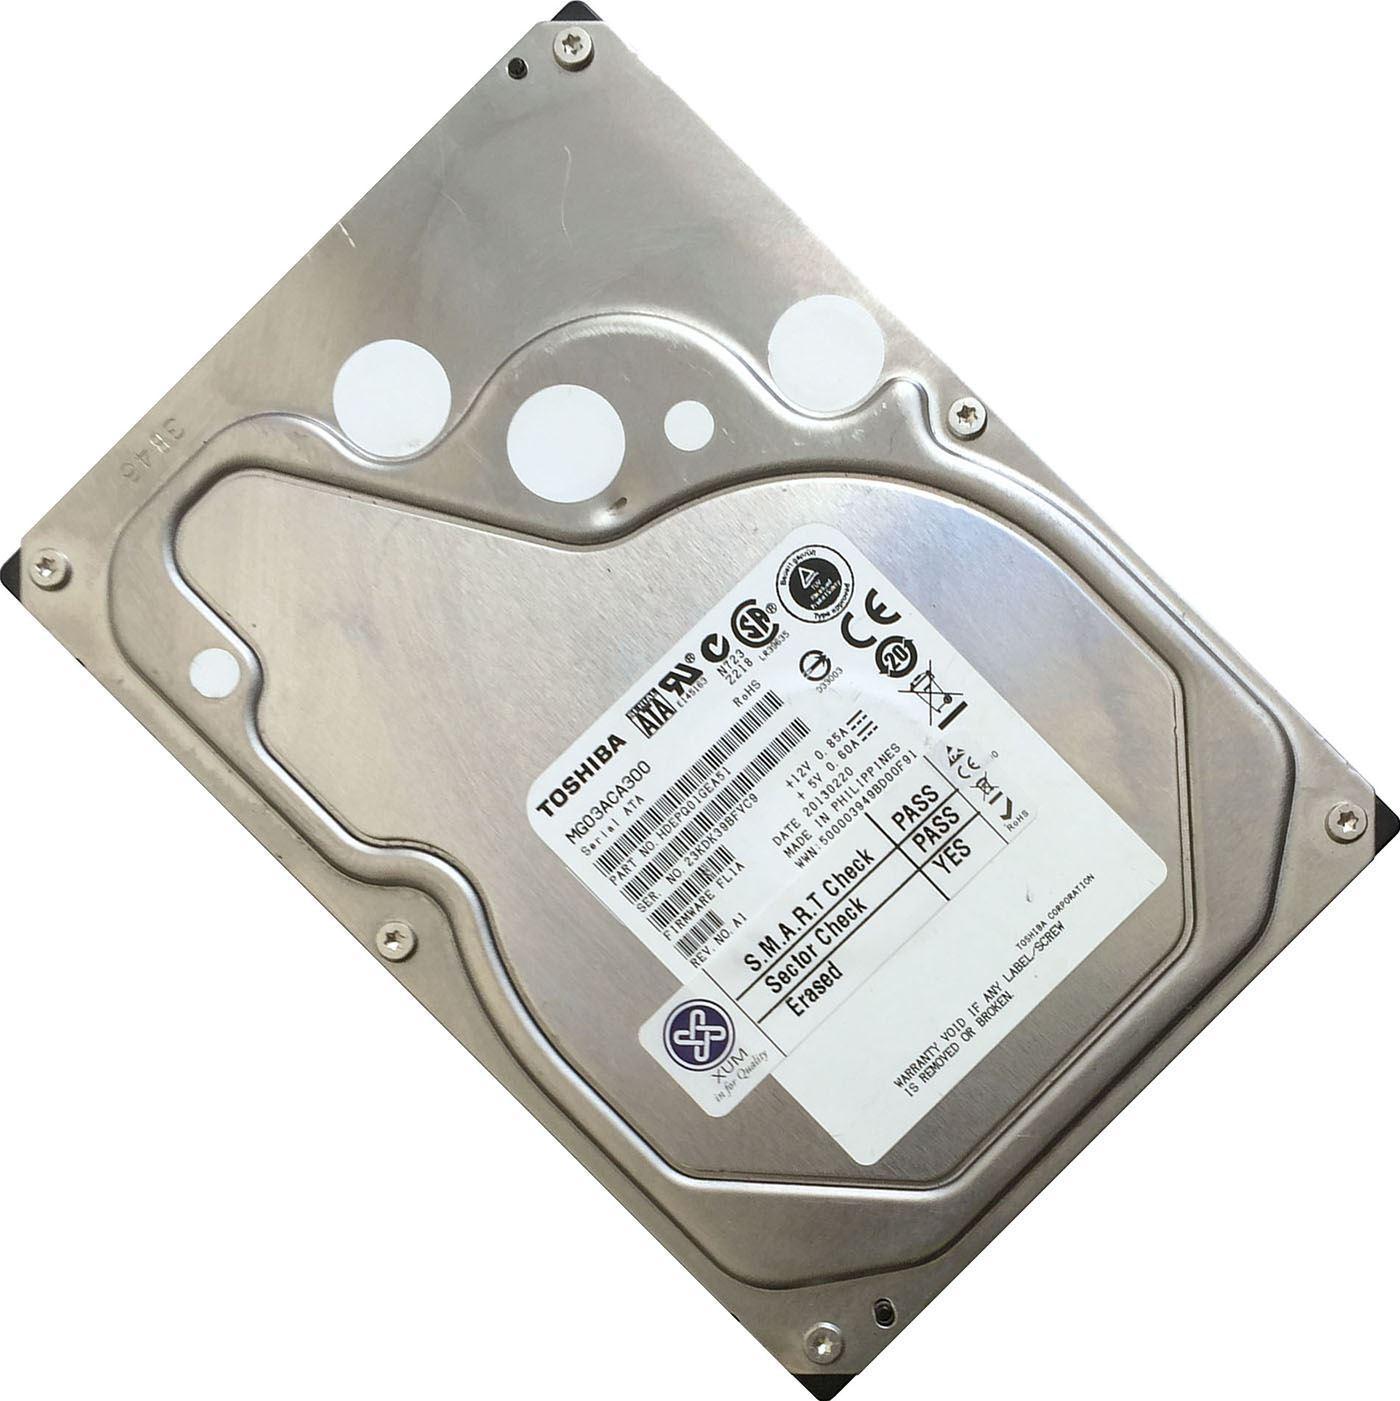 500GB-640GB-750GB-1TB-2TB-3TB-4TB-6TB-8TB-10TB-3-5-034-disco-duro-SATA-HDD-Lote miniatura 19